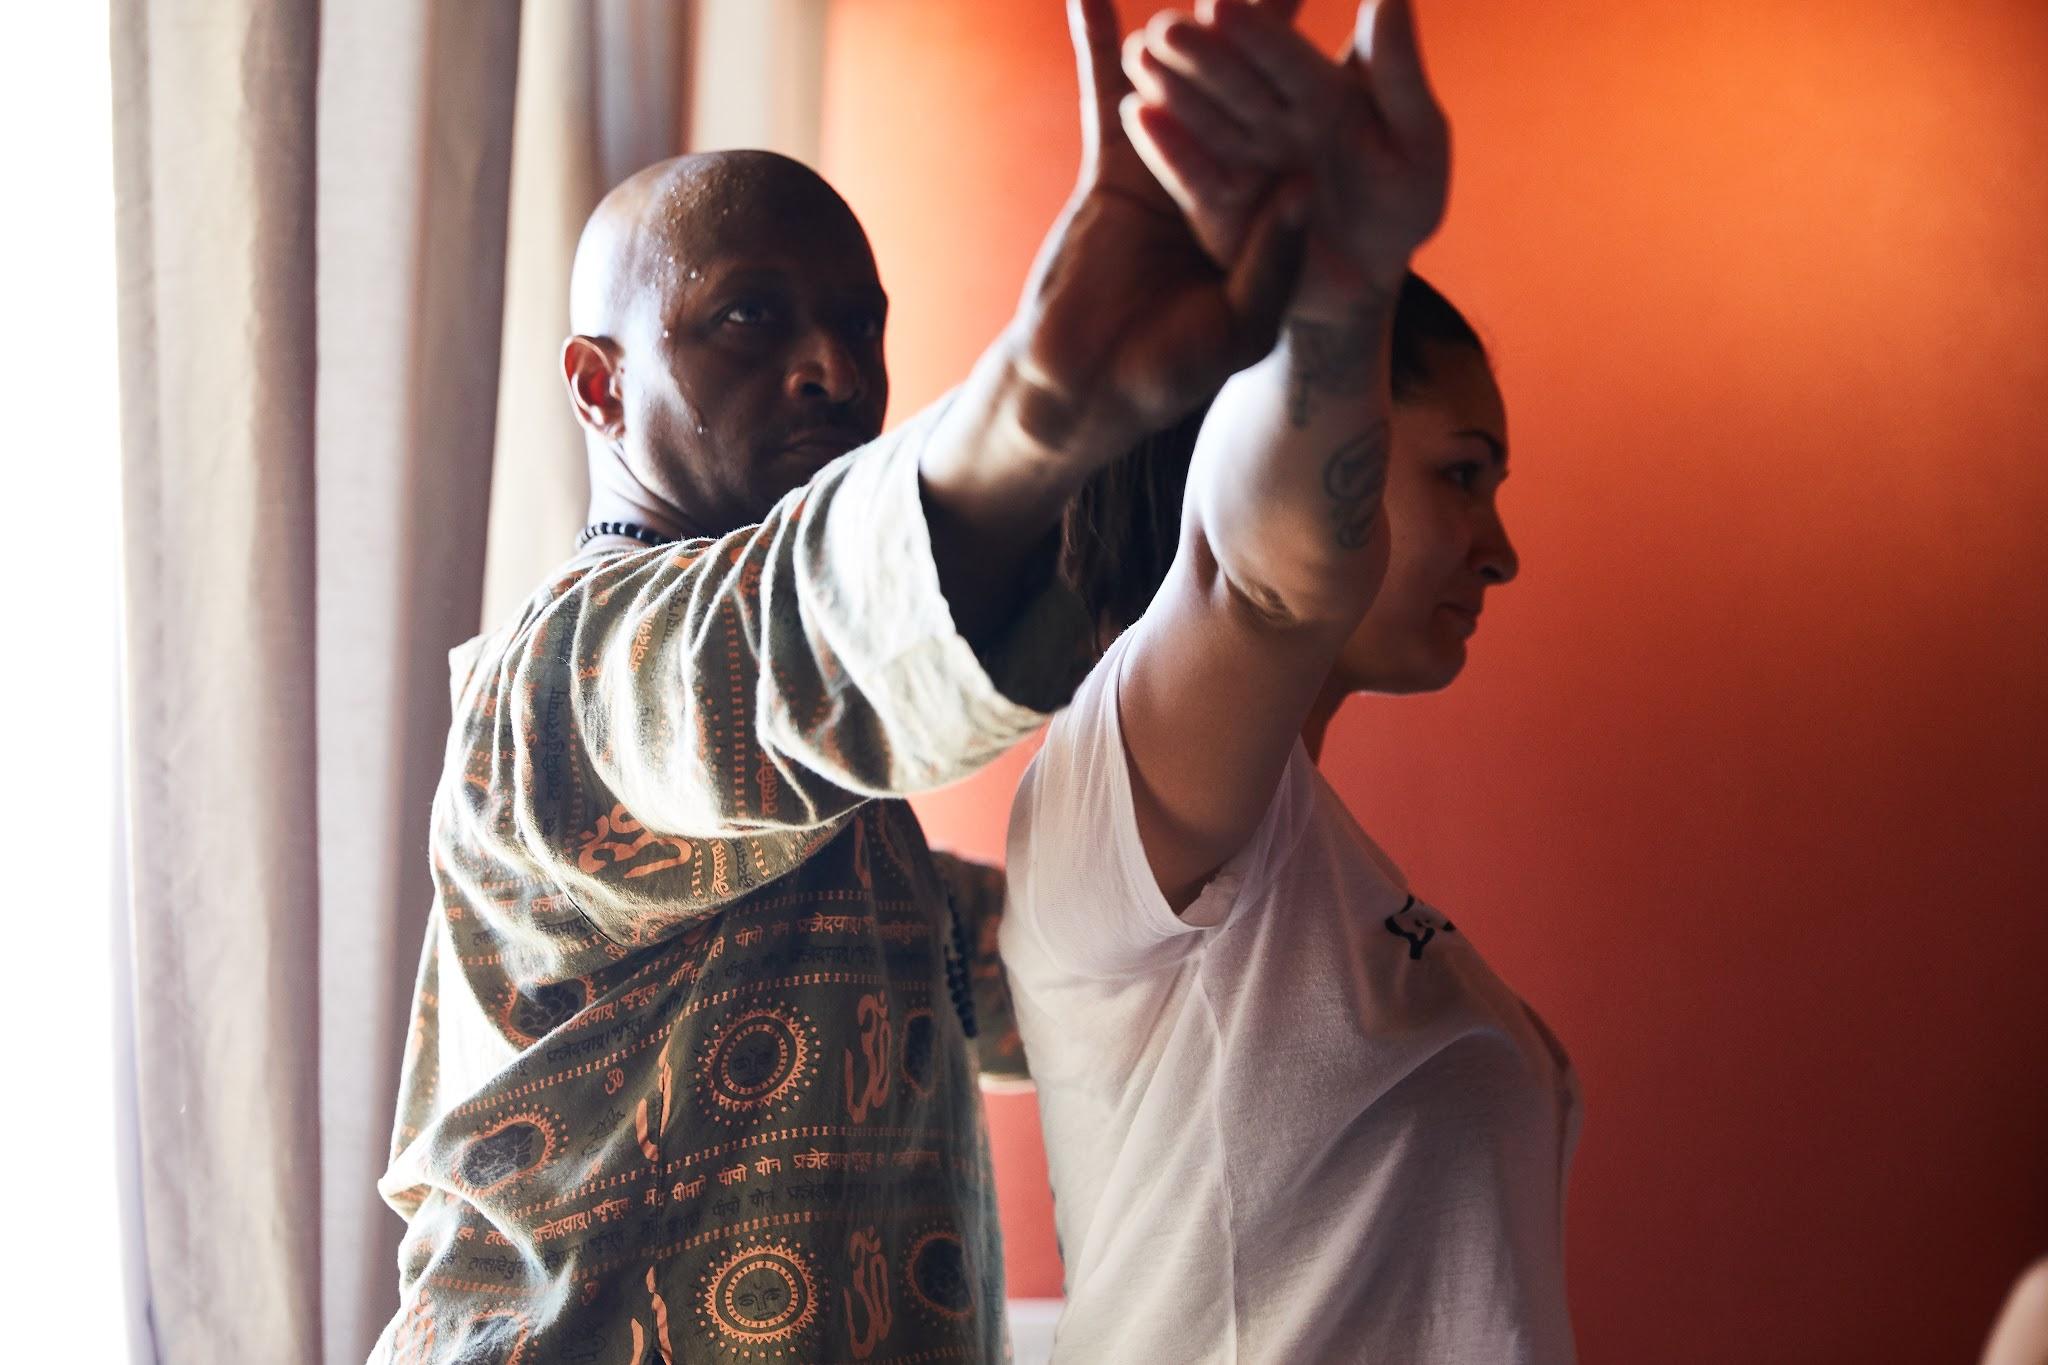 "Zeek Vincent ""Founder of ZFlow Yoga LLC. /Certified International Vinyasa & Yin Yoga Teacher"